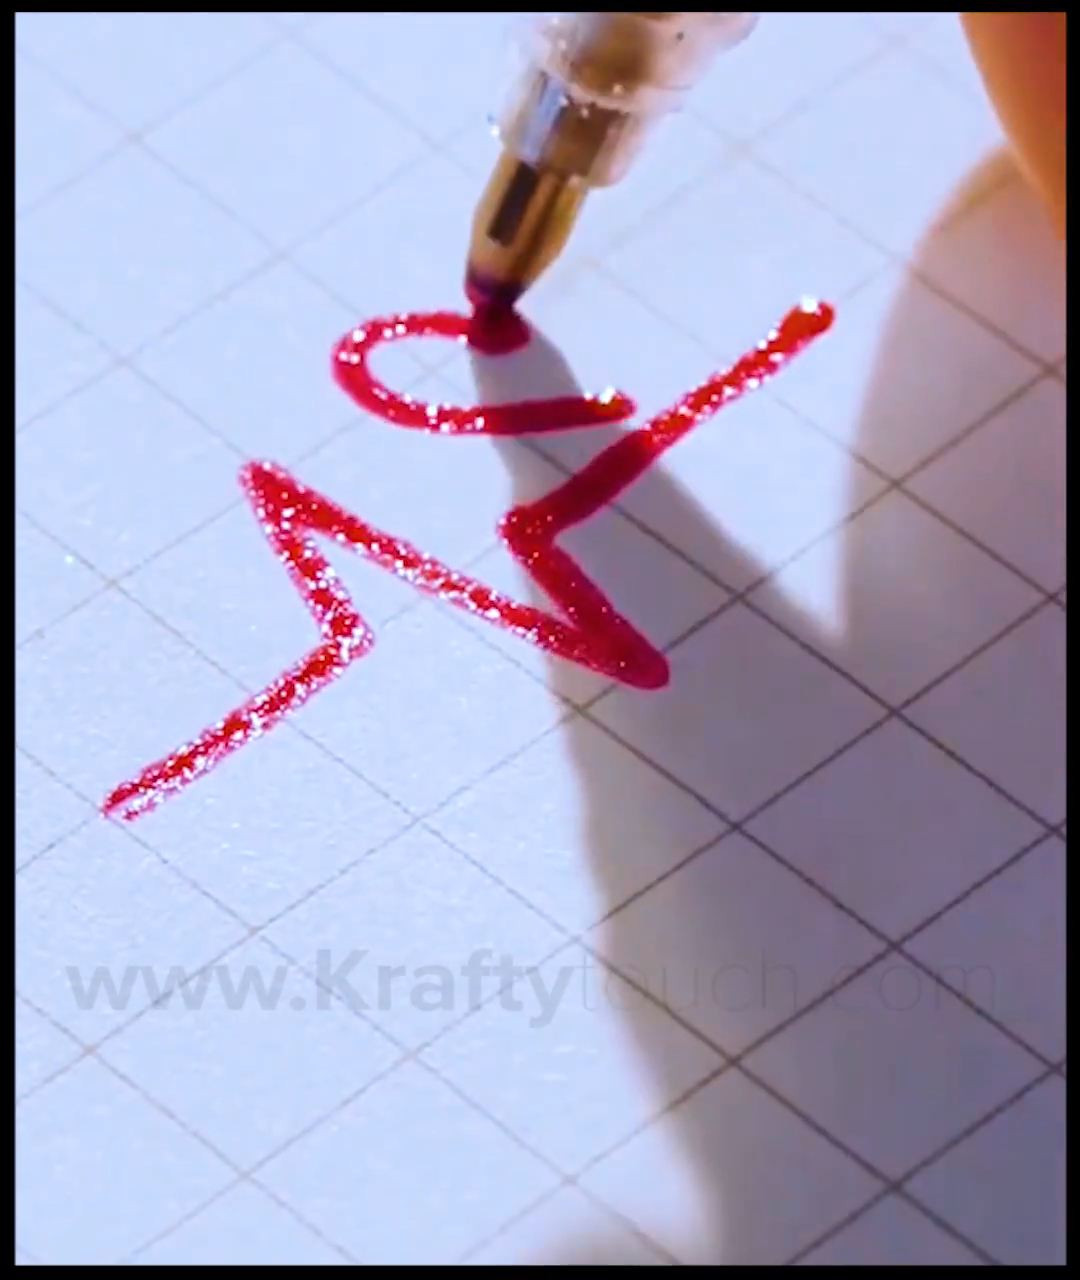 Glitter Gel Pens for Adult Coloring Books  – Dibujo - Pour Vous